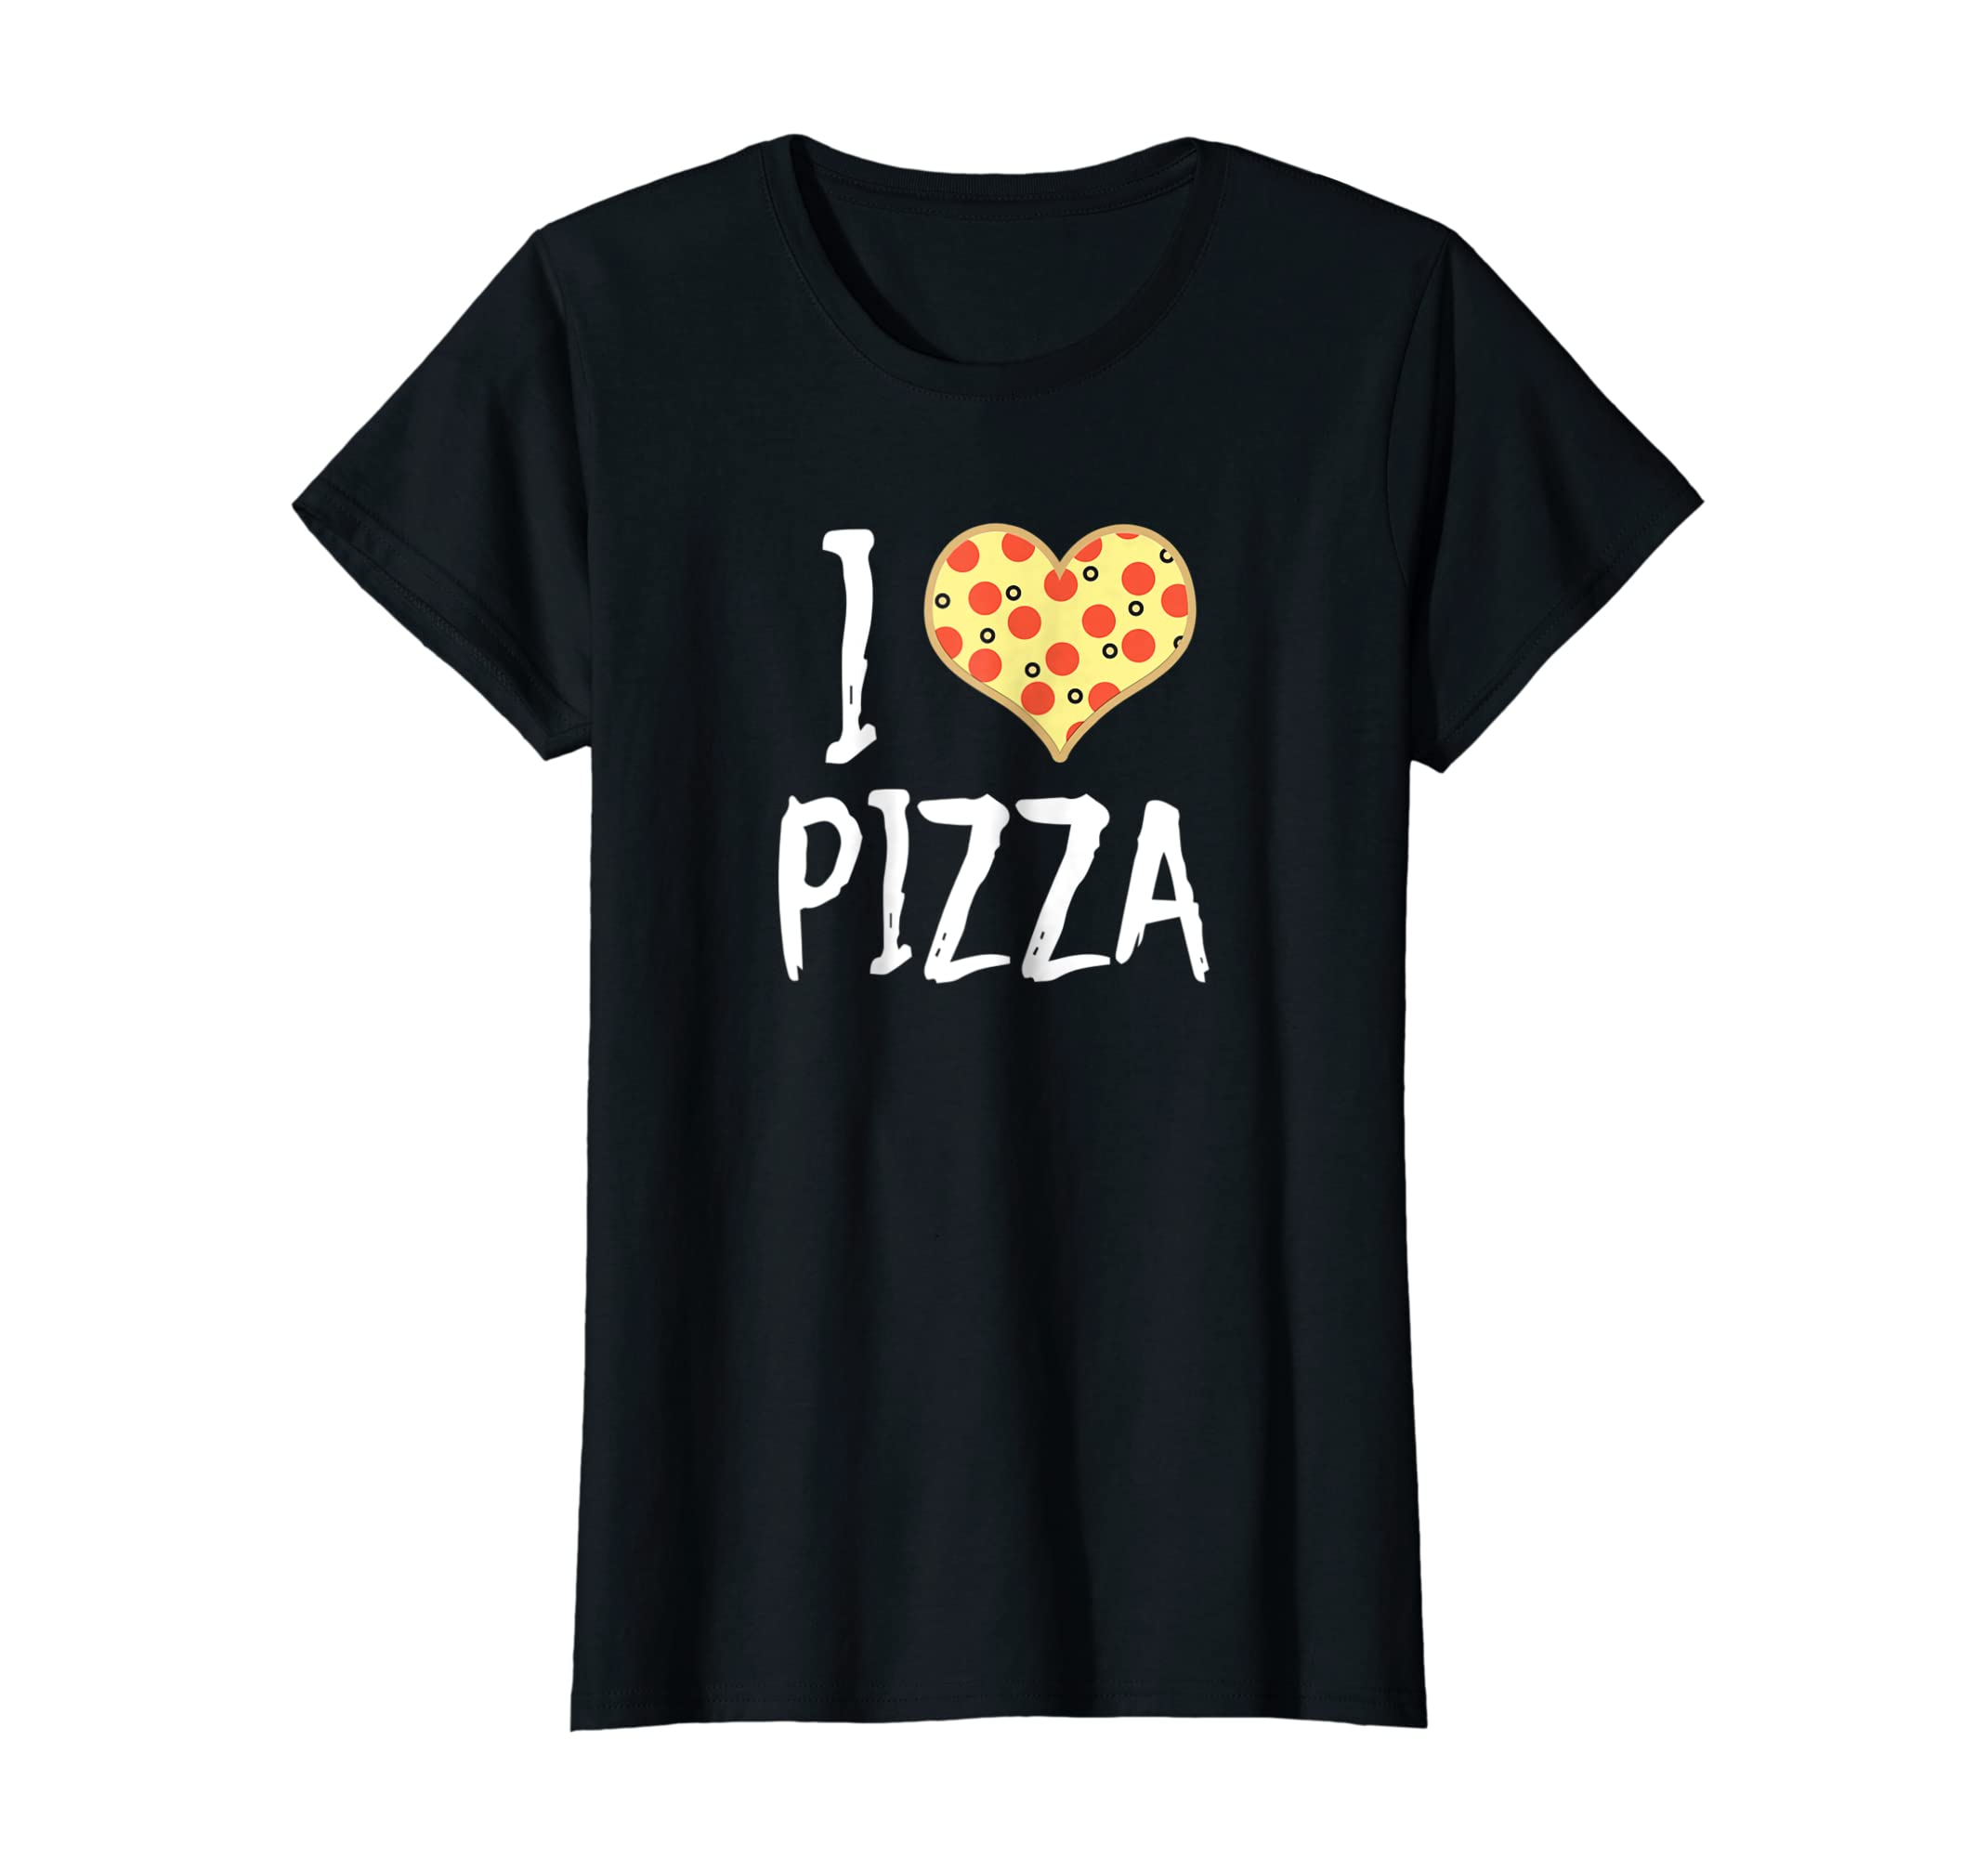 e3cf879f7 Amazon.com: I Love Pizza T Shirt Funny Pizza Lover Gifts: Clothing